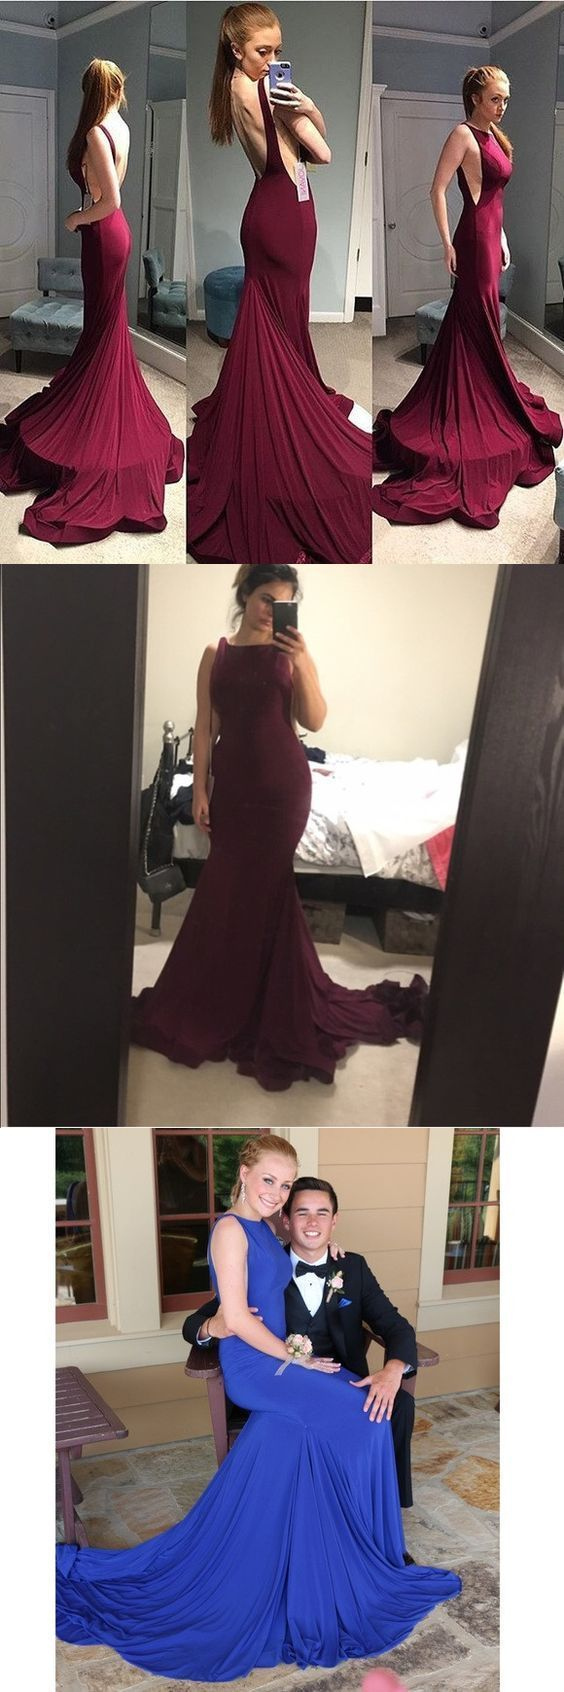 Burgundy prom dresses long prom dresses trumpetmermaid prom